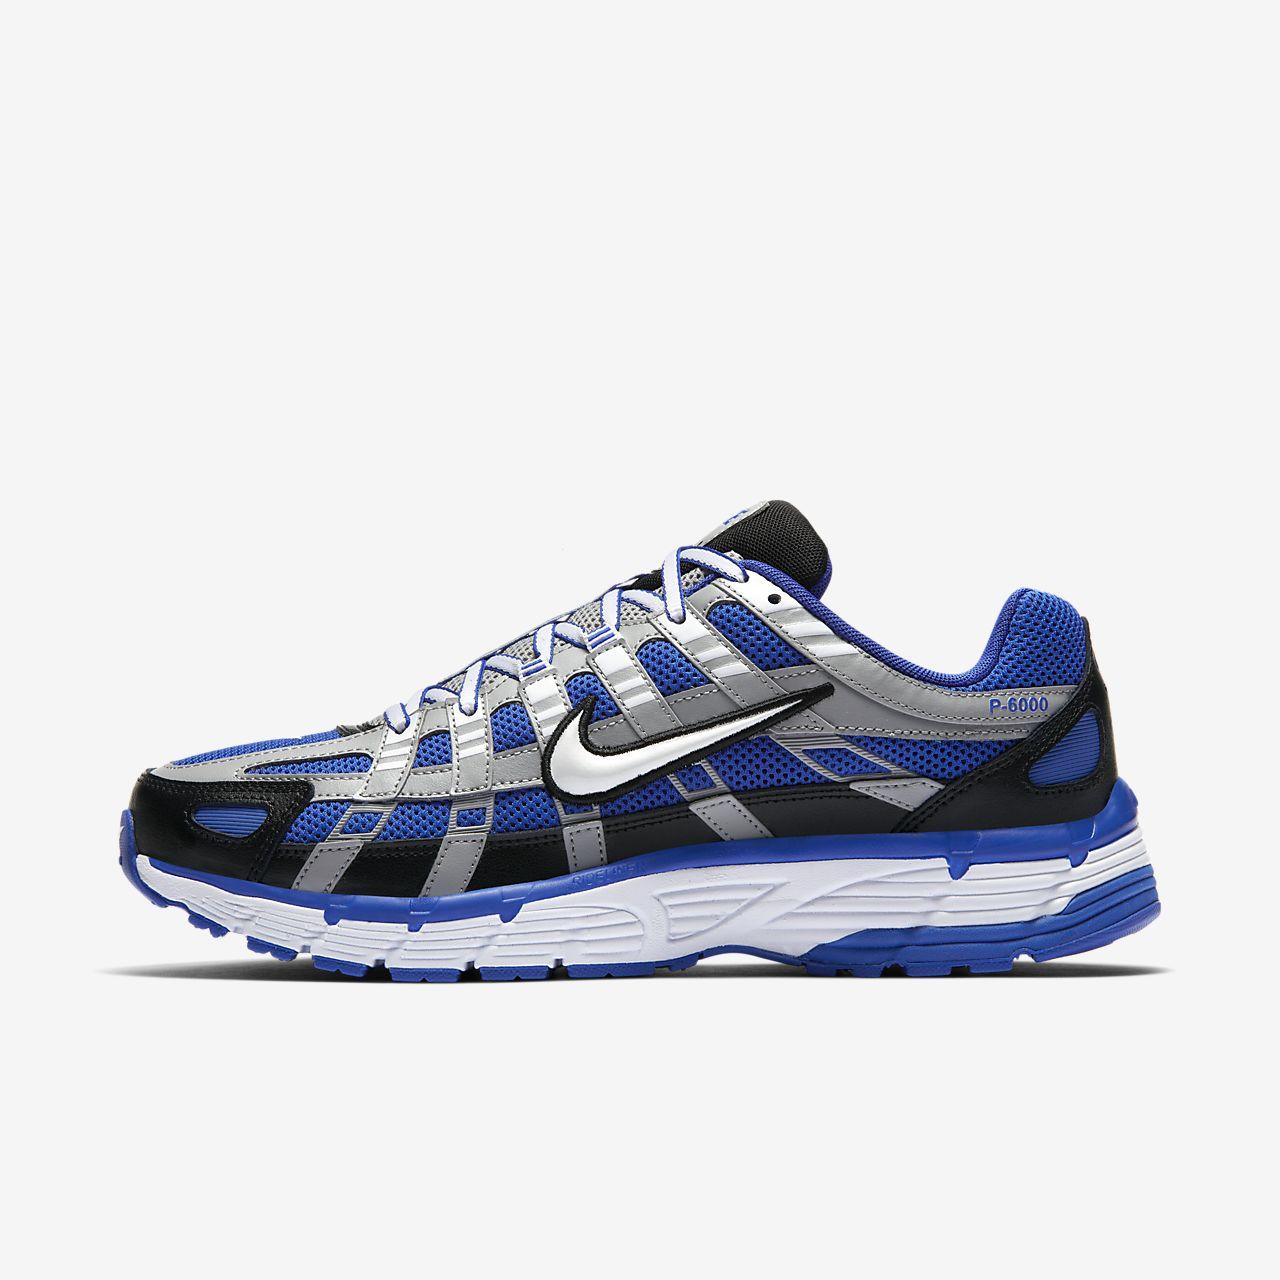 Nike P-6000 鞋款